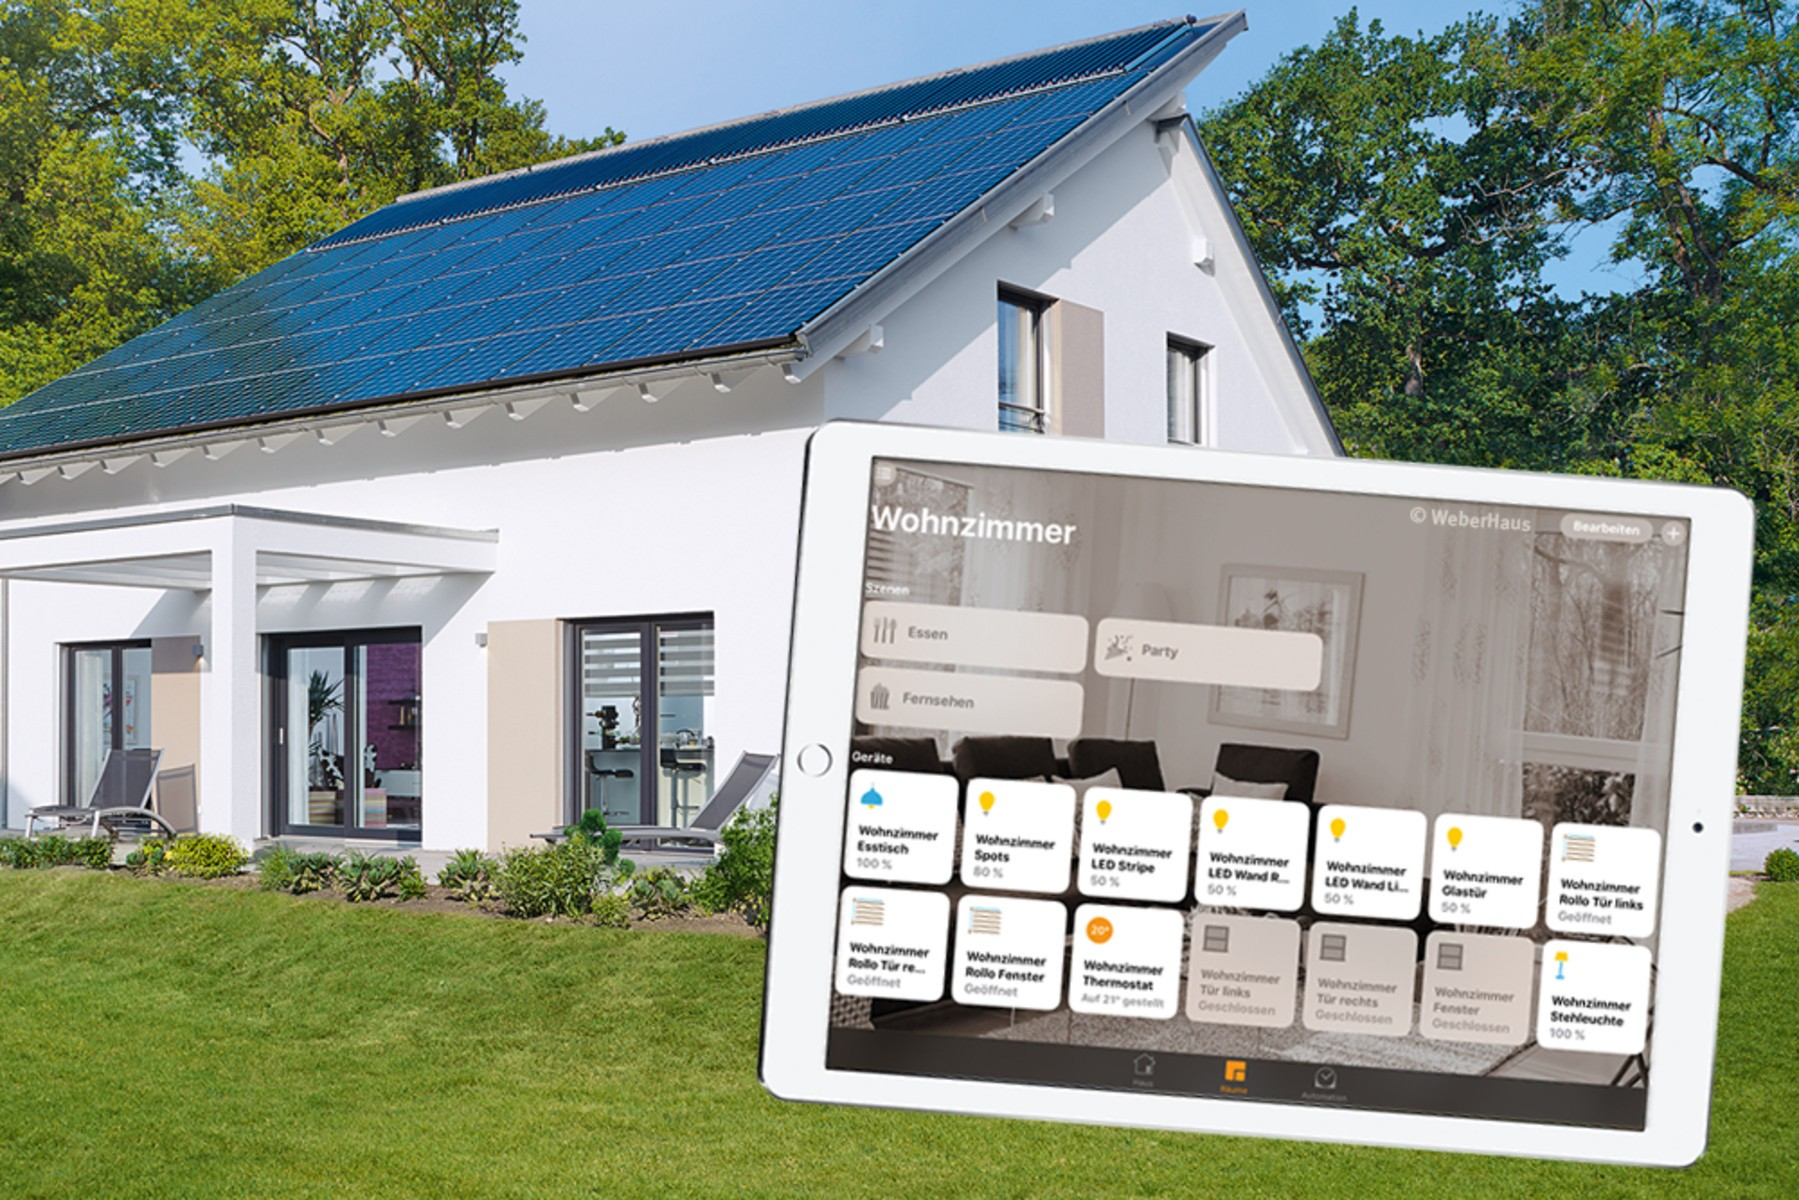 WeberHaus Builds Houses With HomeKit